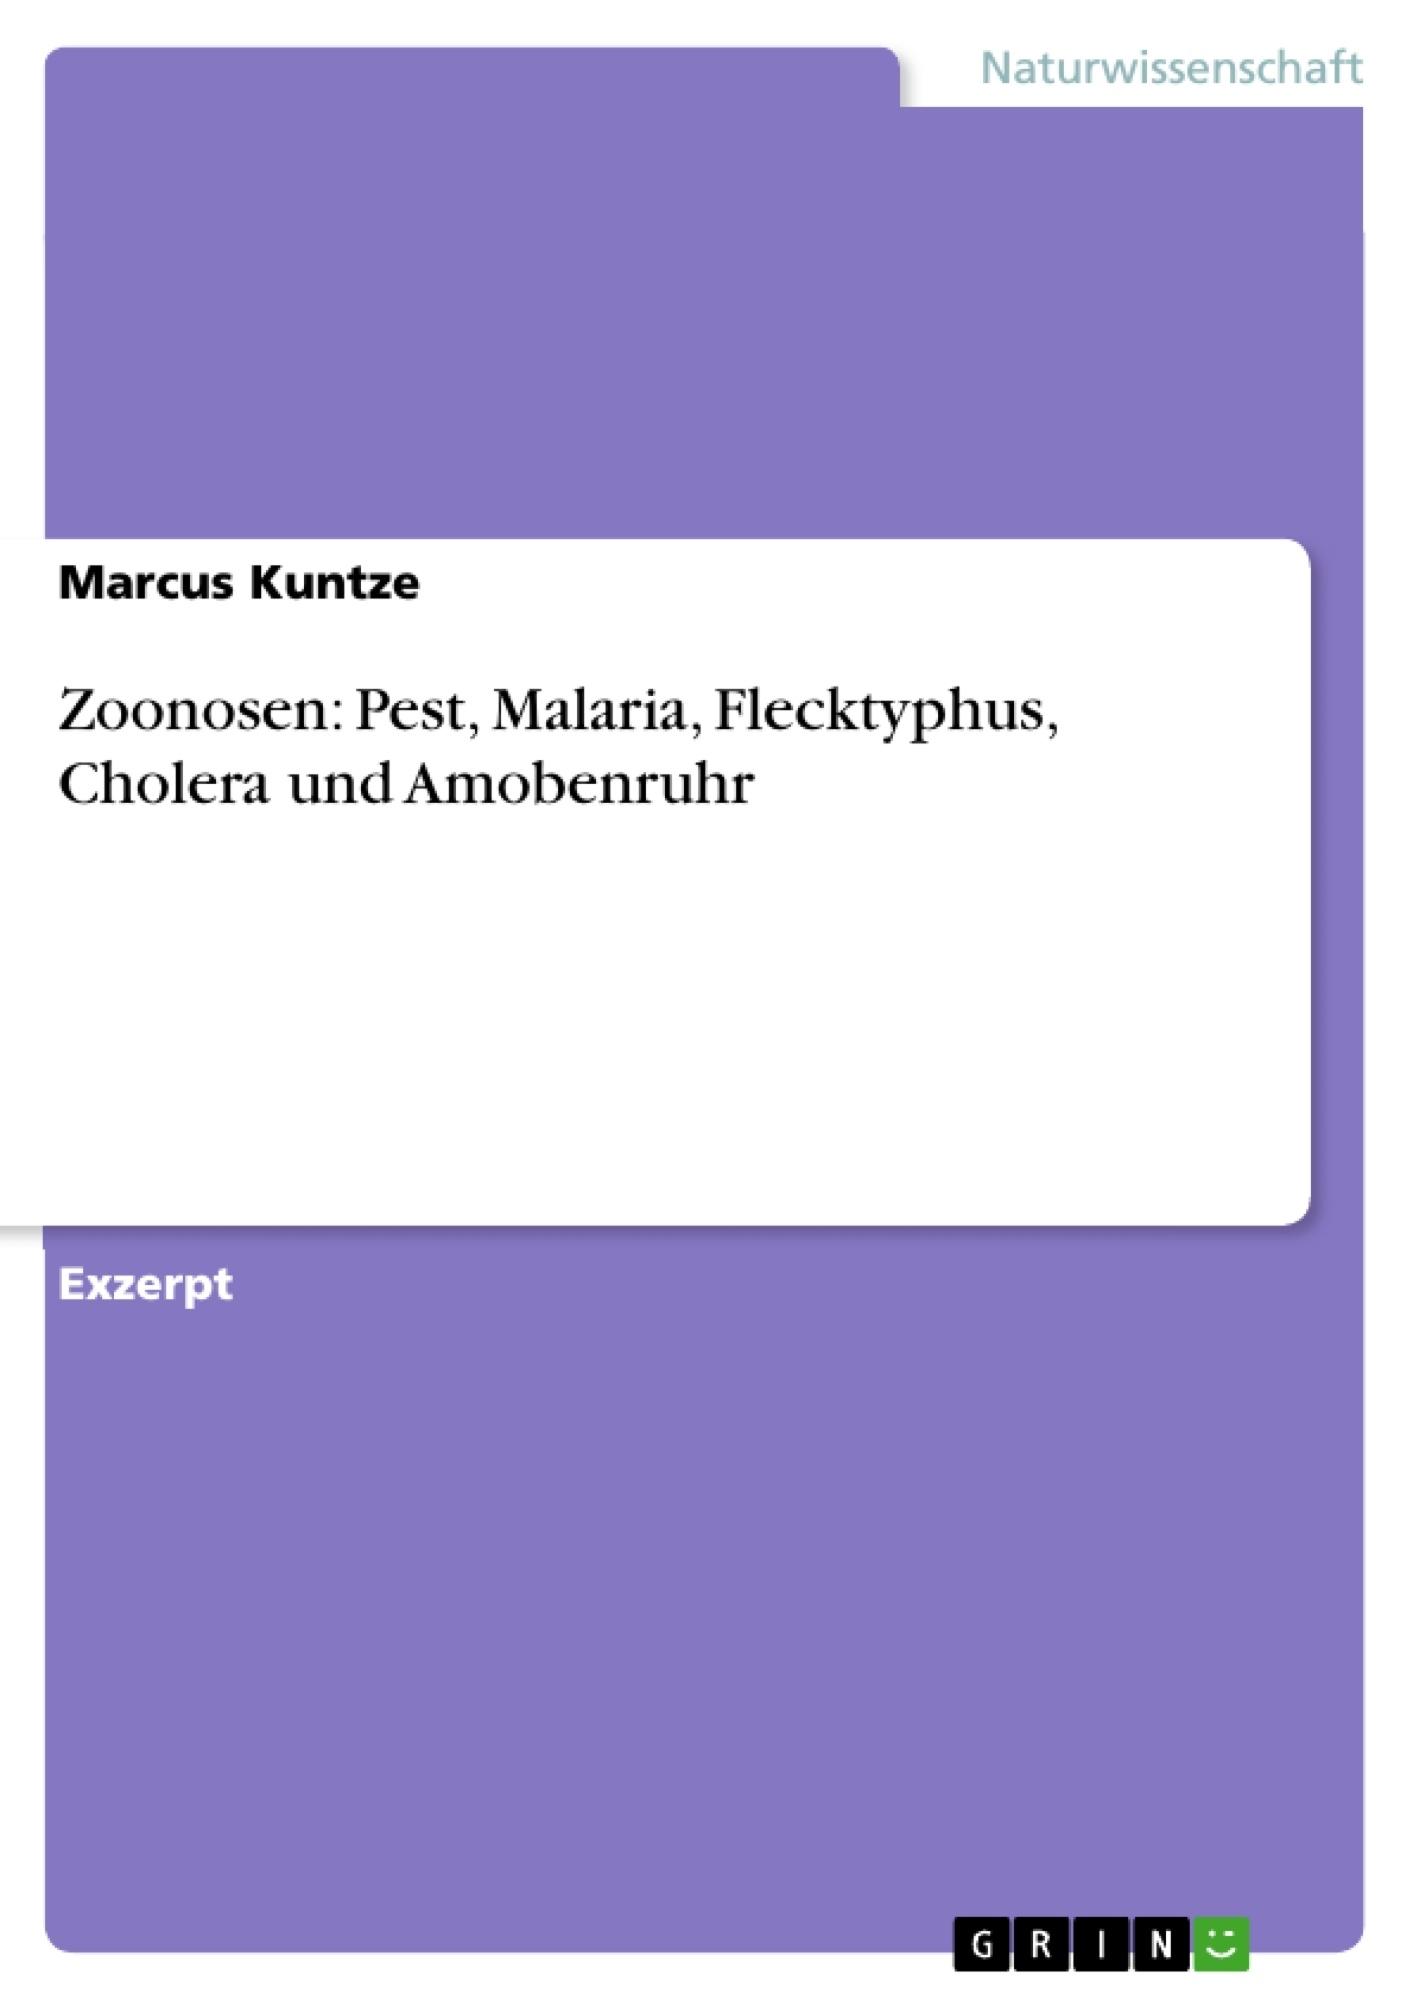 Titel: Zoonosen: Pest, Malaria, Flecktyphus, Cholera und Amobenruhr